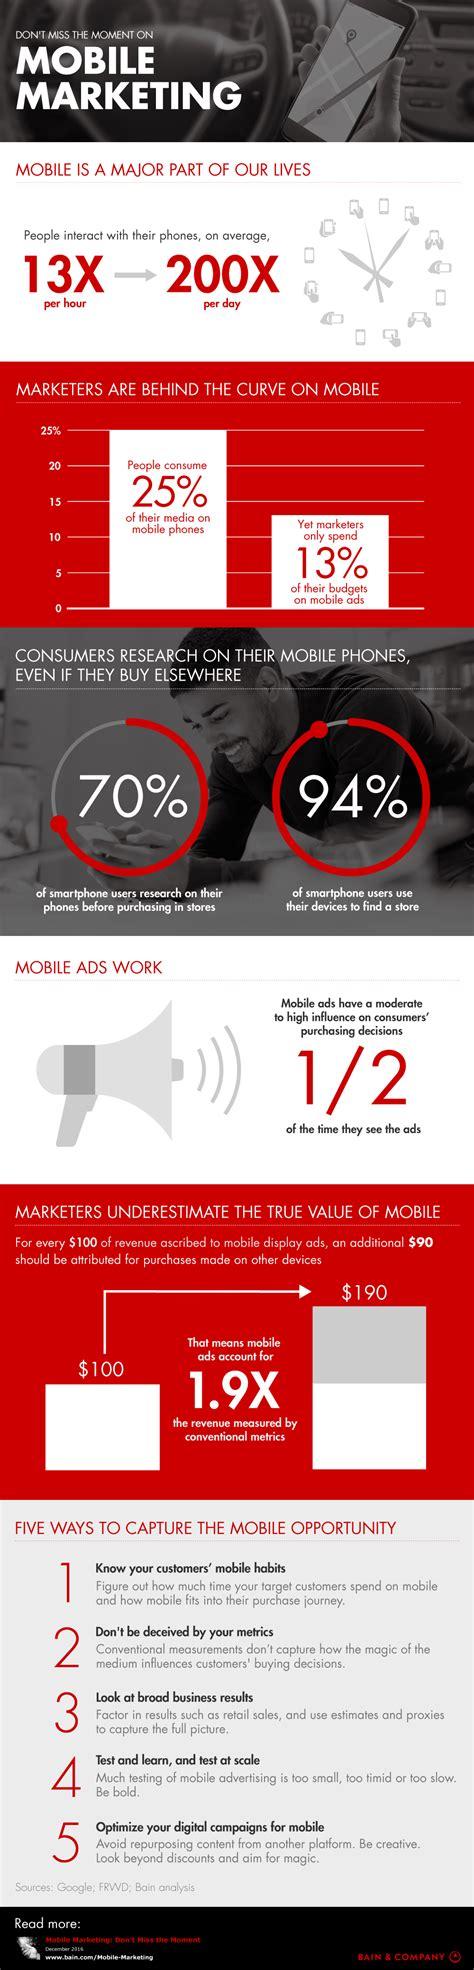 Mobile Marketing infographic - Bain & Company Insights